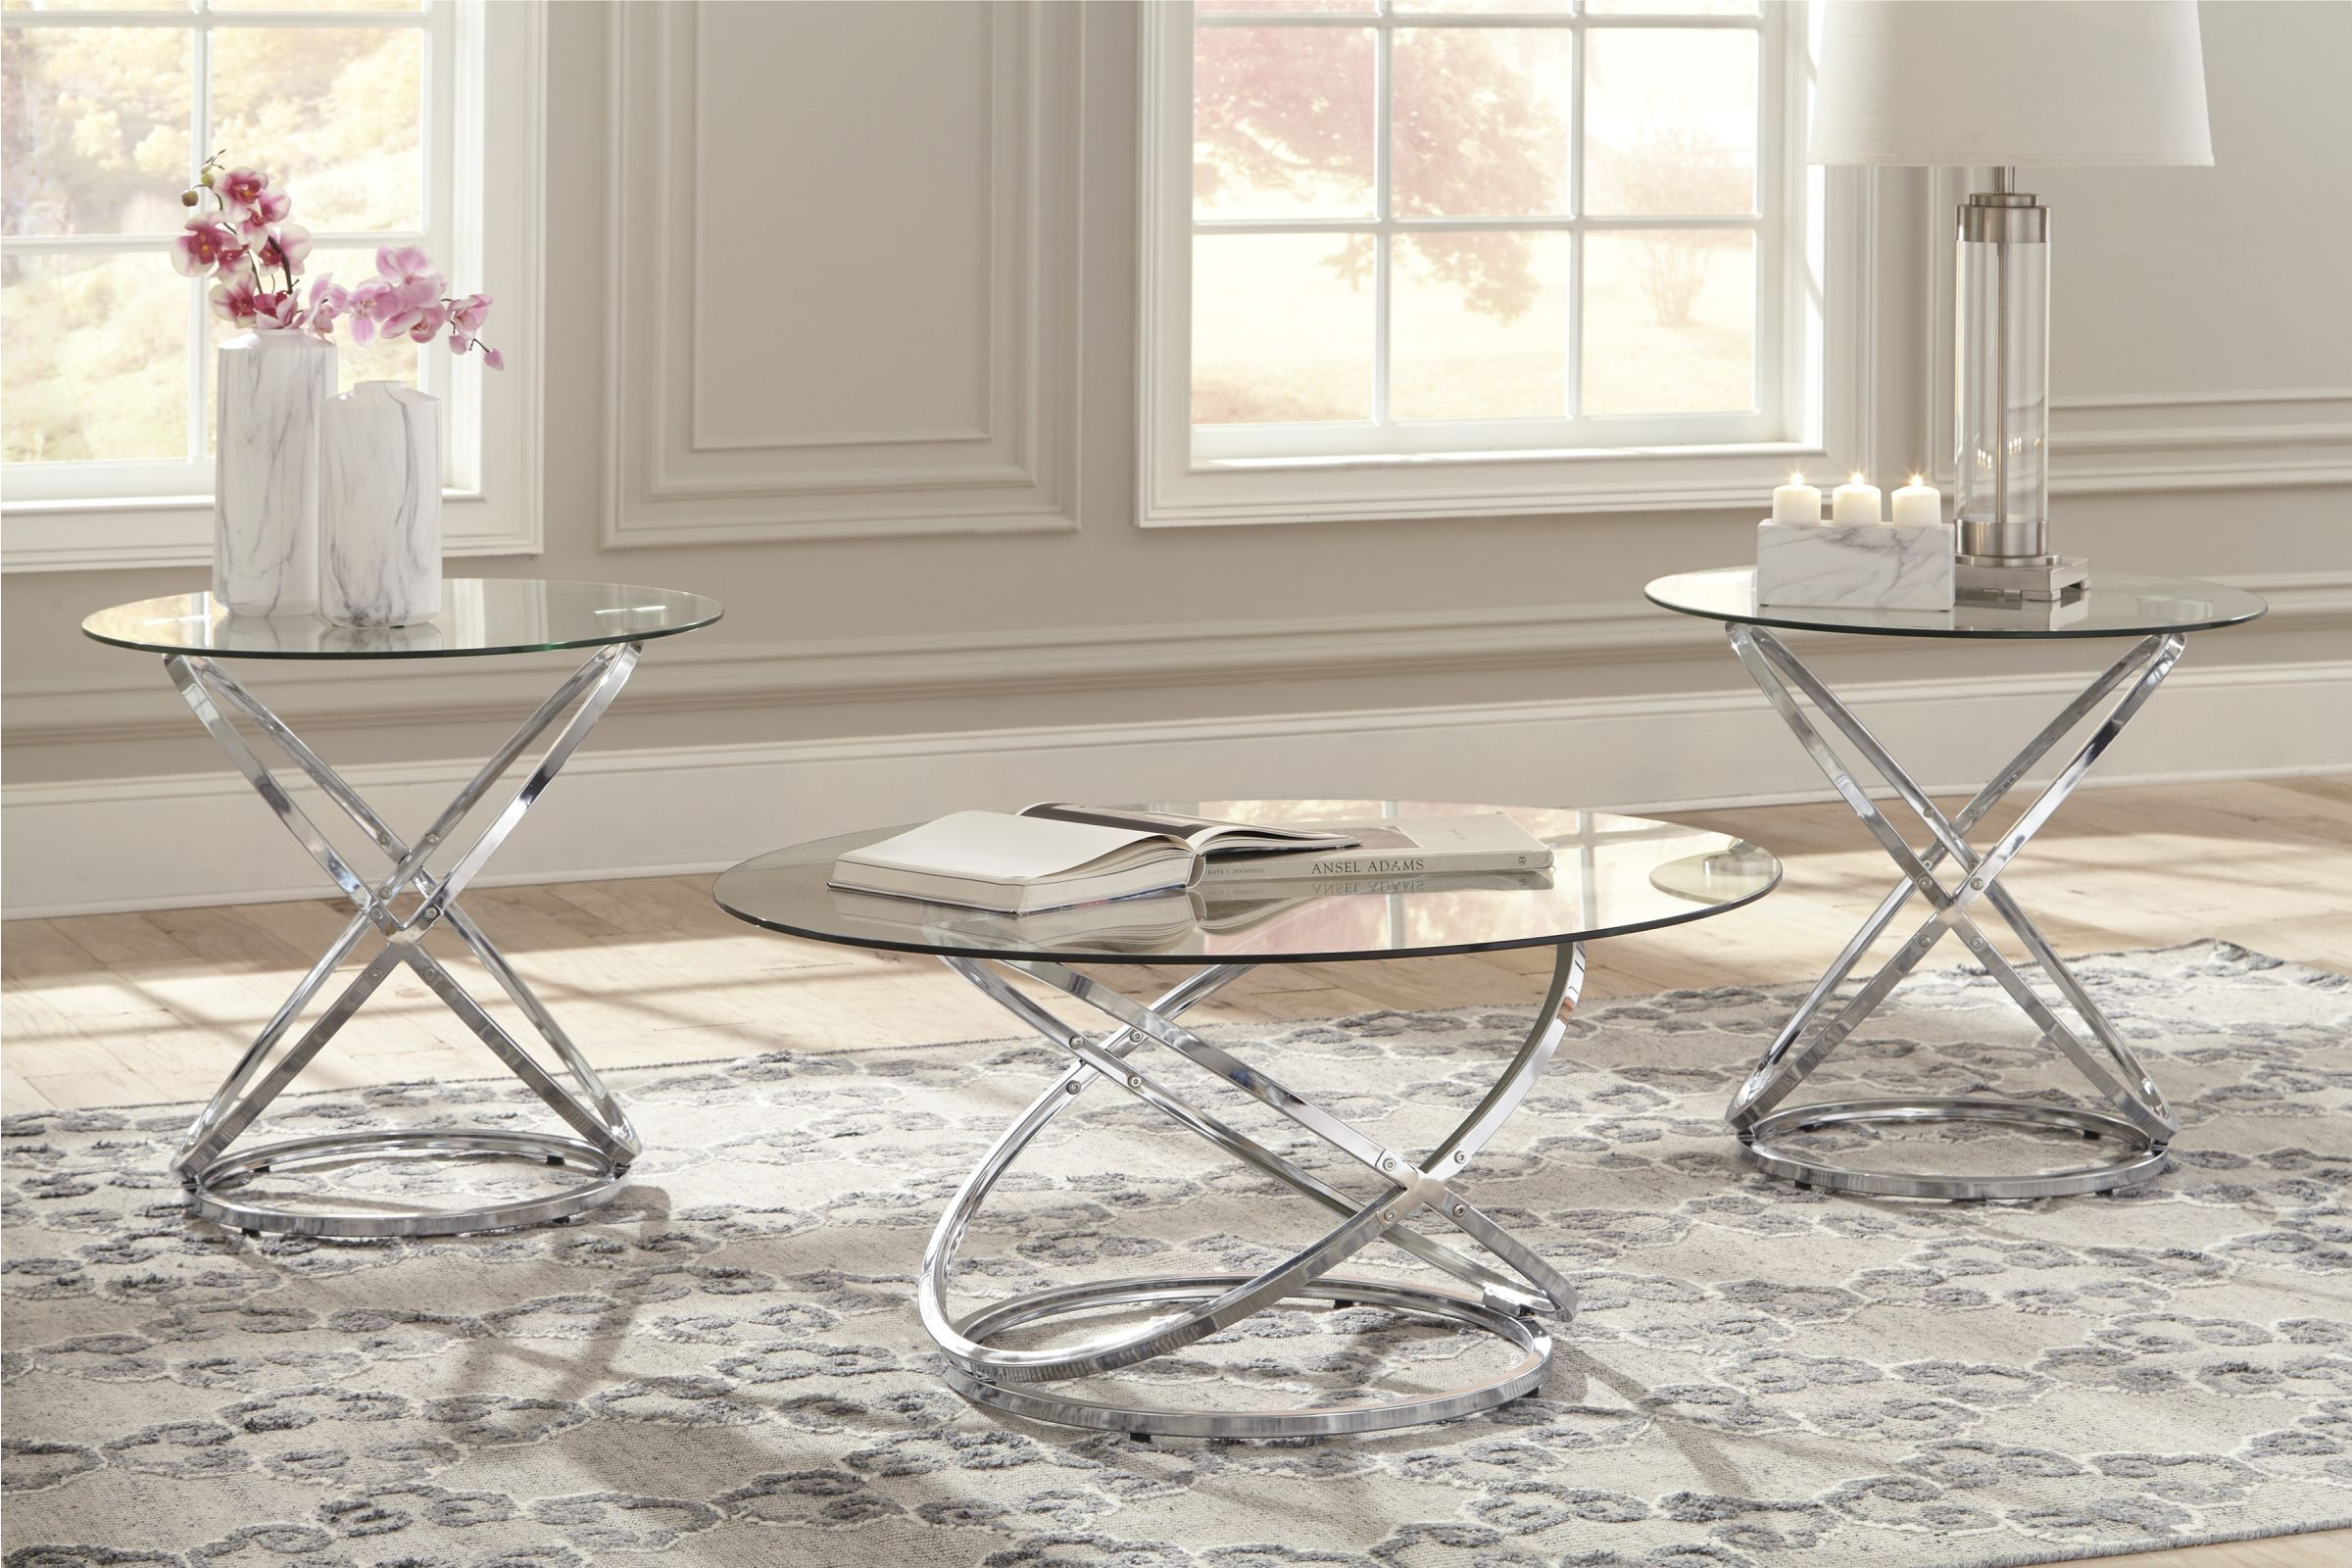 Hollynyx Occasional Table 3er Set von Ashley - #ashley #hollynyx #occasional #table - #TopHomeDecorCoffeeTables